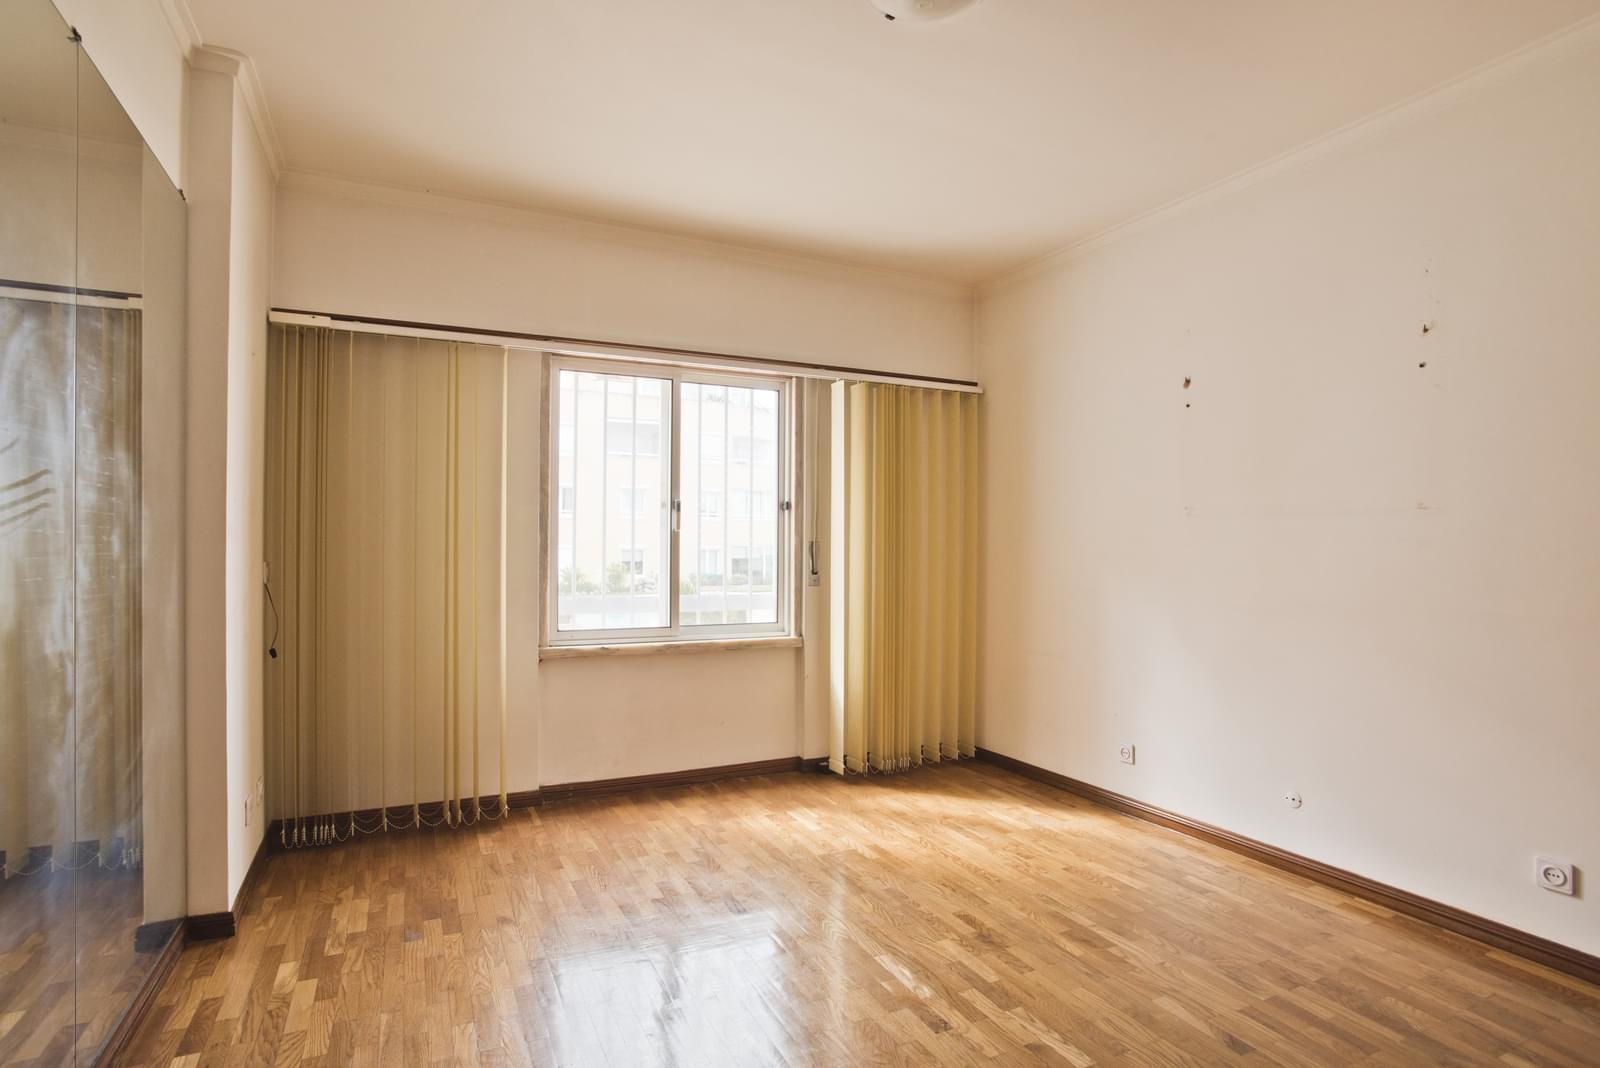 pf17280-apartamento-t2-cascais-3dc0786c-53ce-4d33-9f3b-ef91b2525bc6